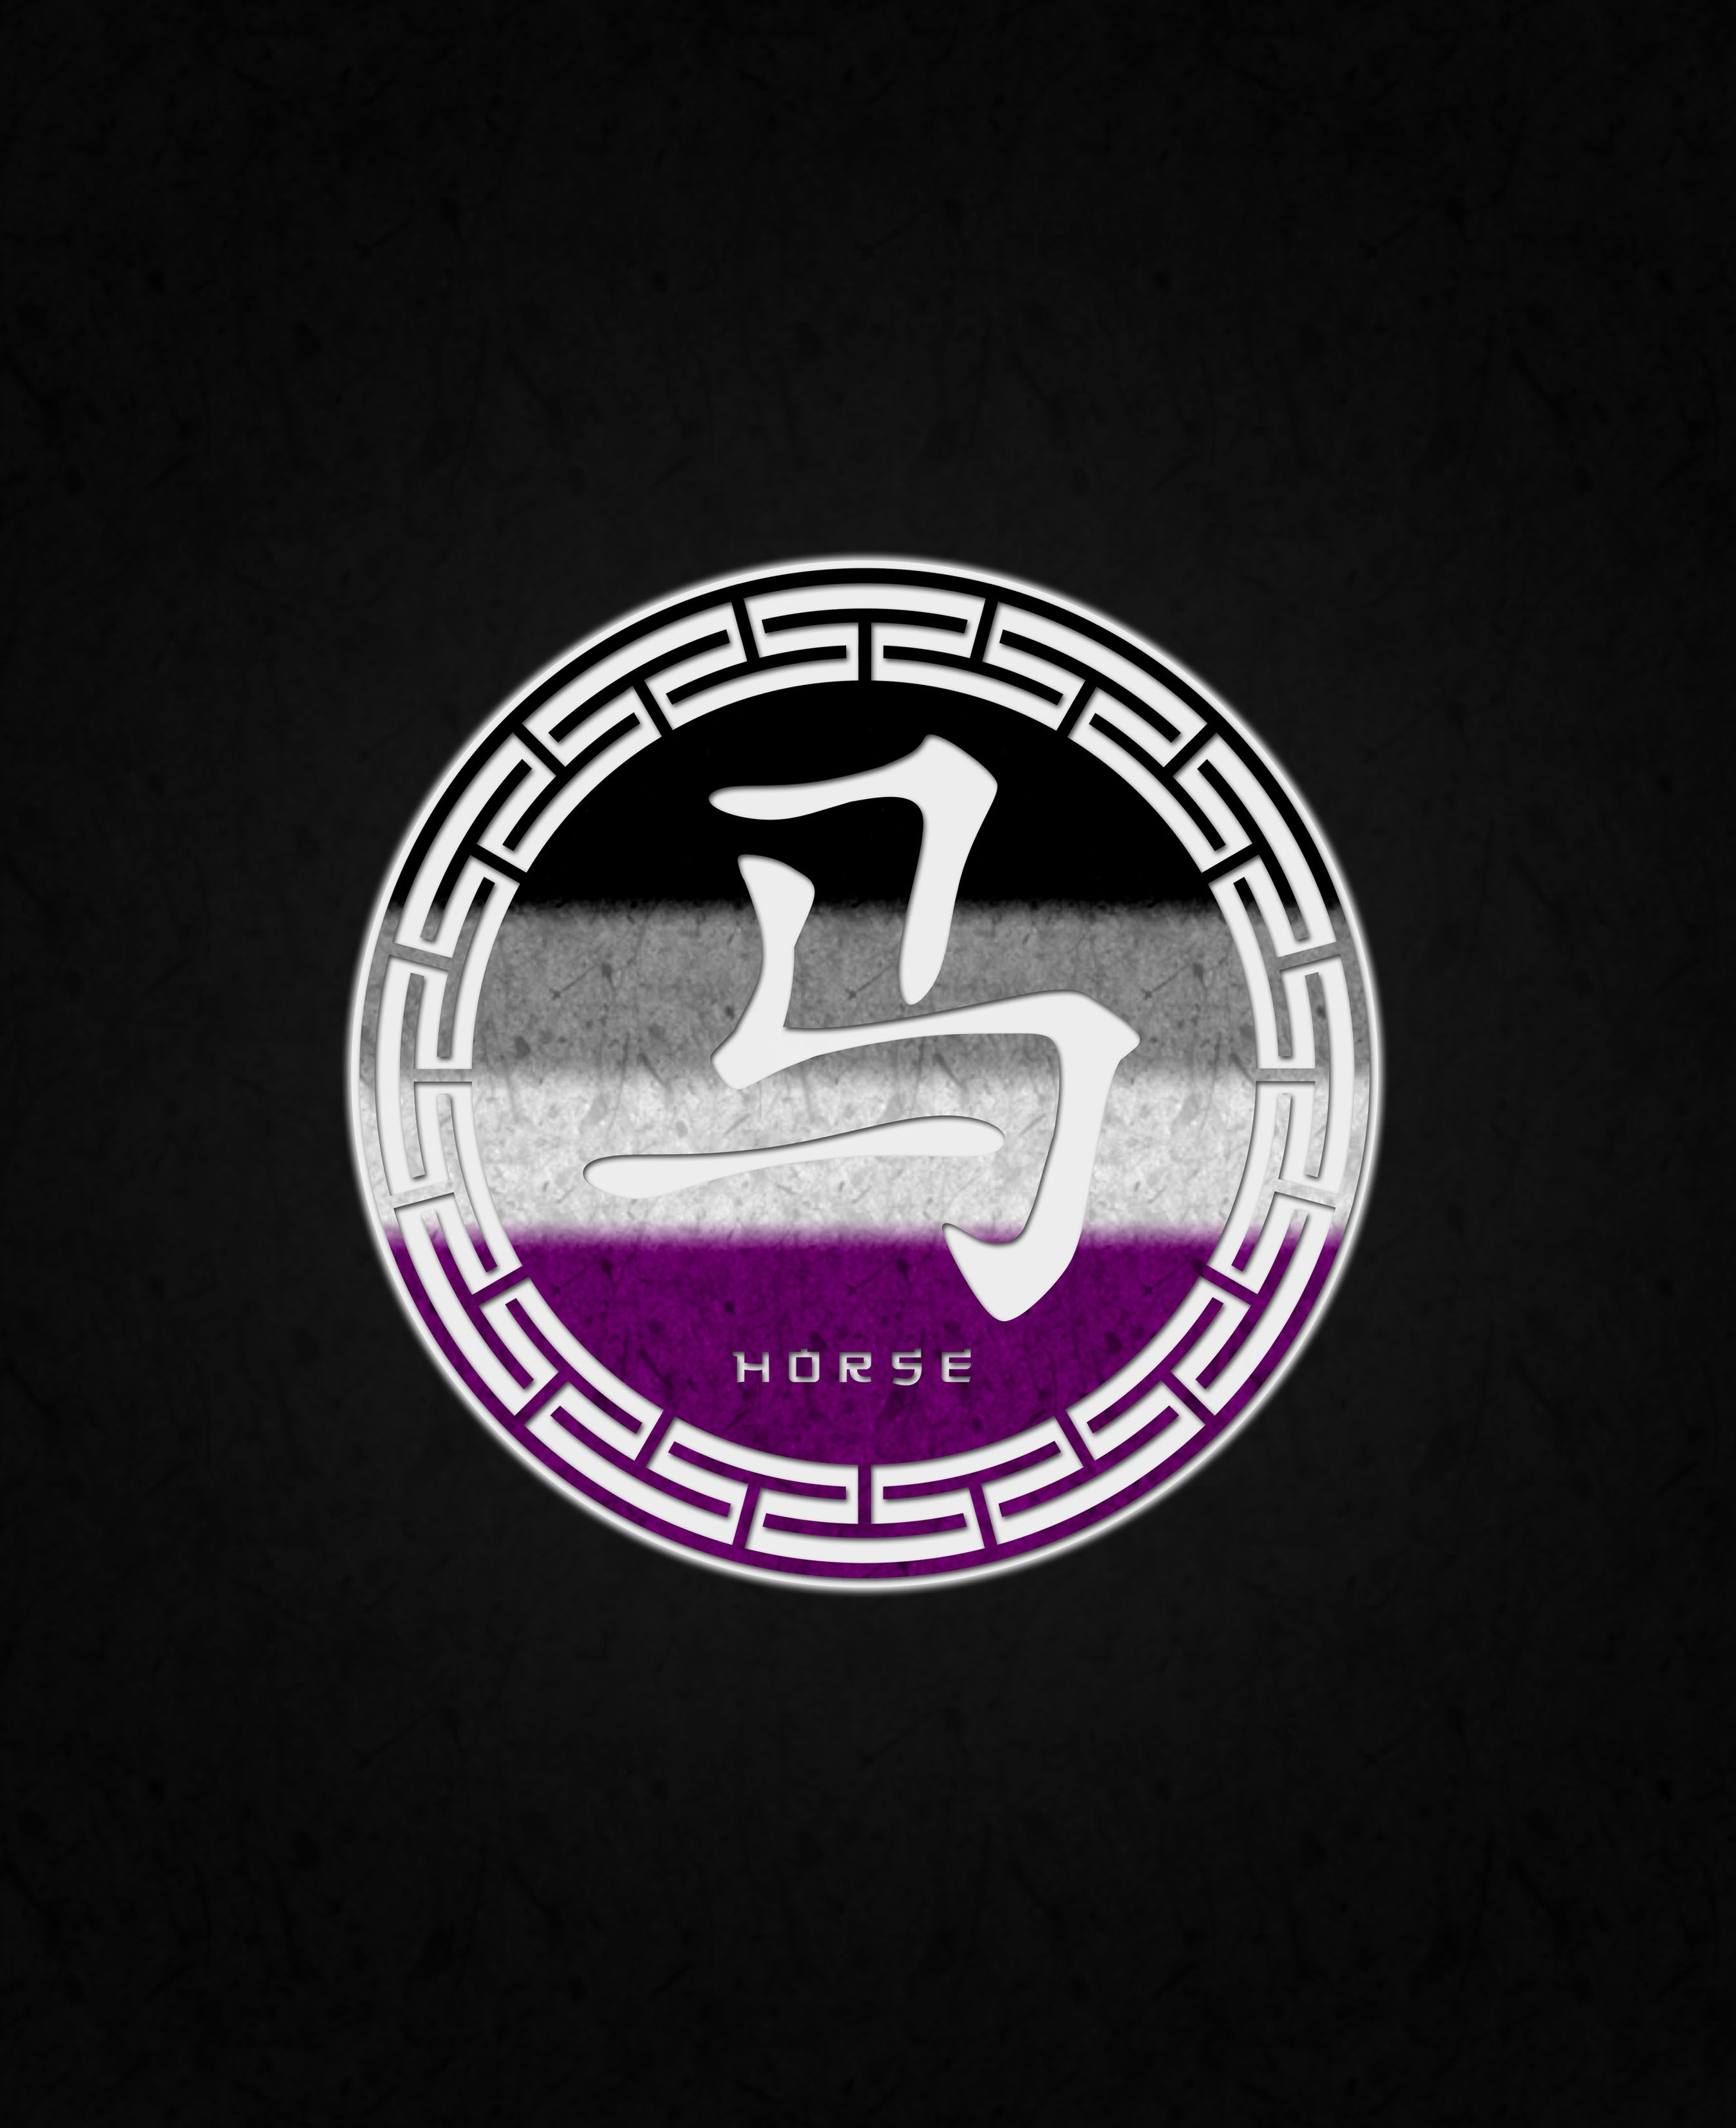 Asexual pride chinese horoscope horse symbol in asexual pride asexual pride chinese horoscope horse symbol in asexual pride flag colors asexual asexy buycottarizona